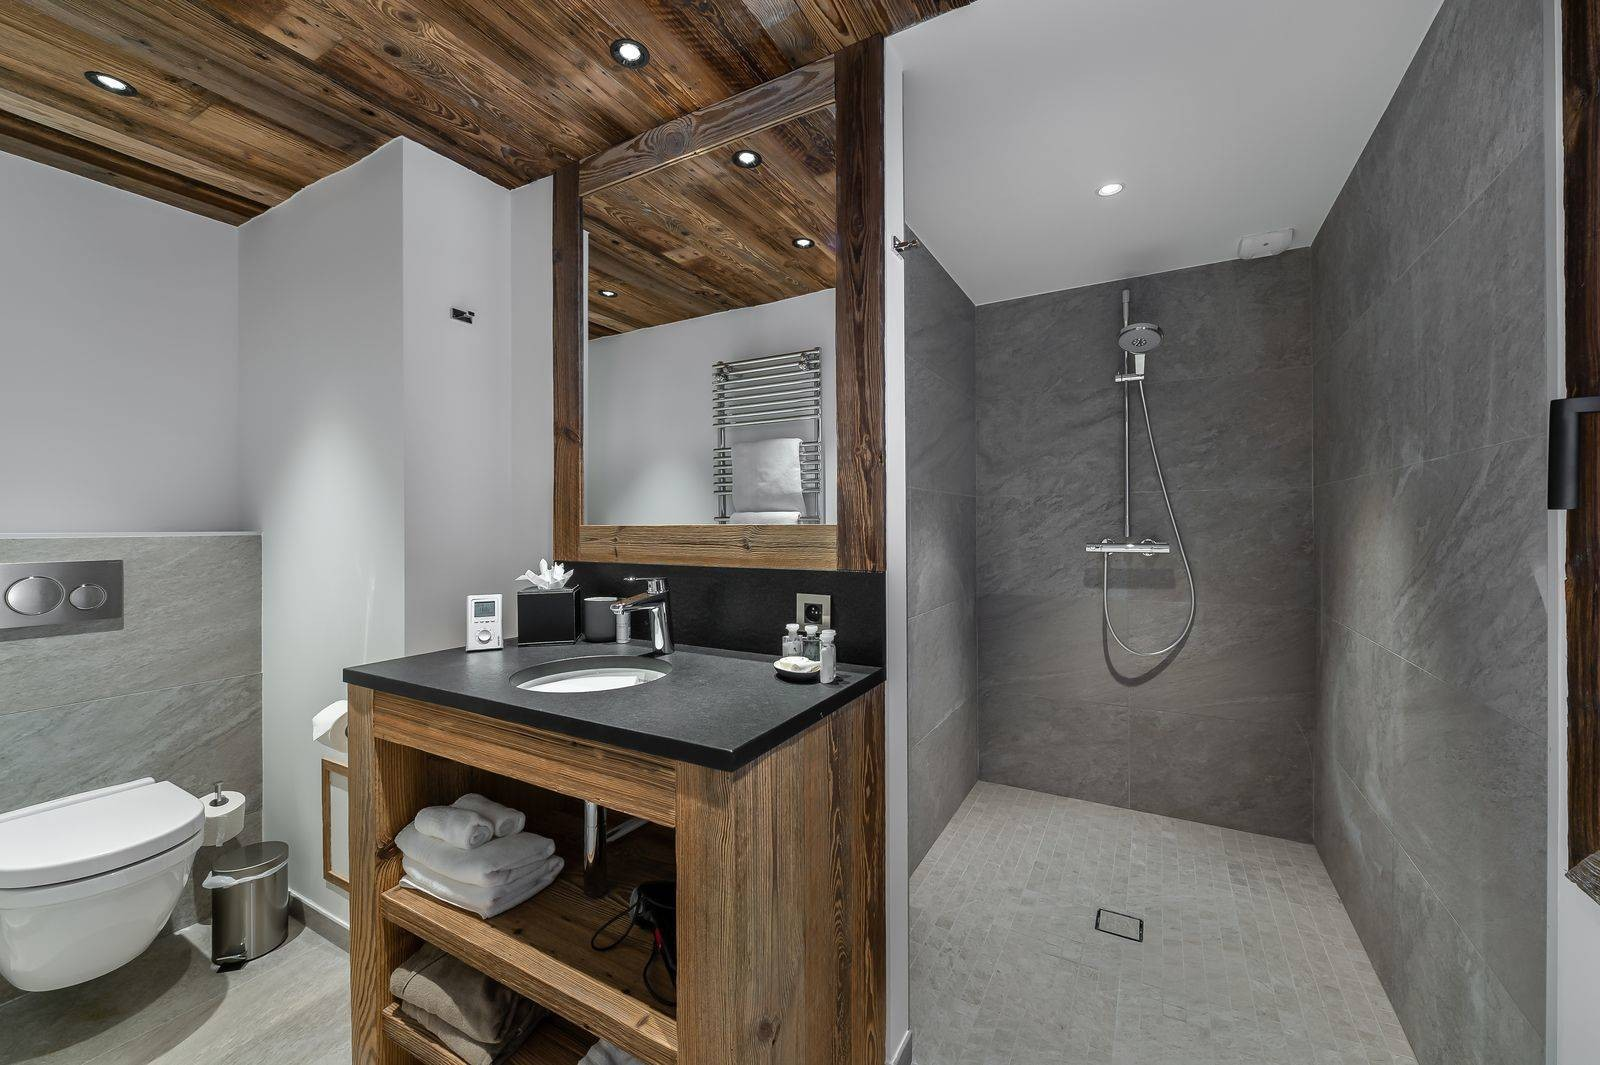 Saint Martin De Belleville Luxury Rental Chalet Ipaliu Bathroom